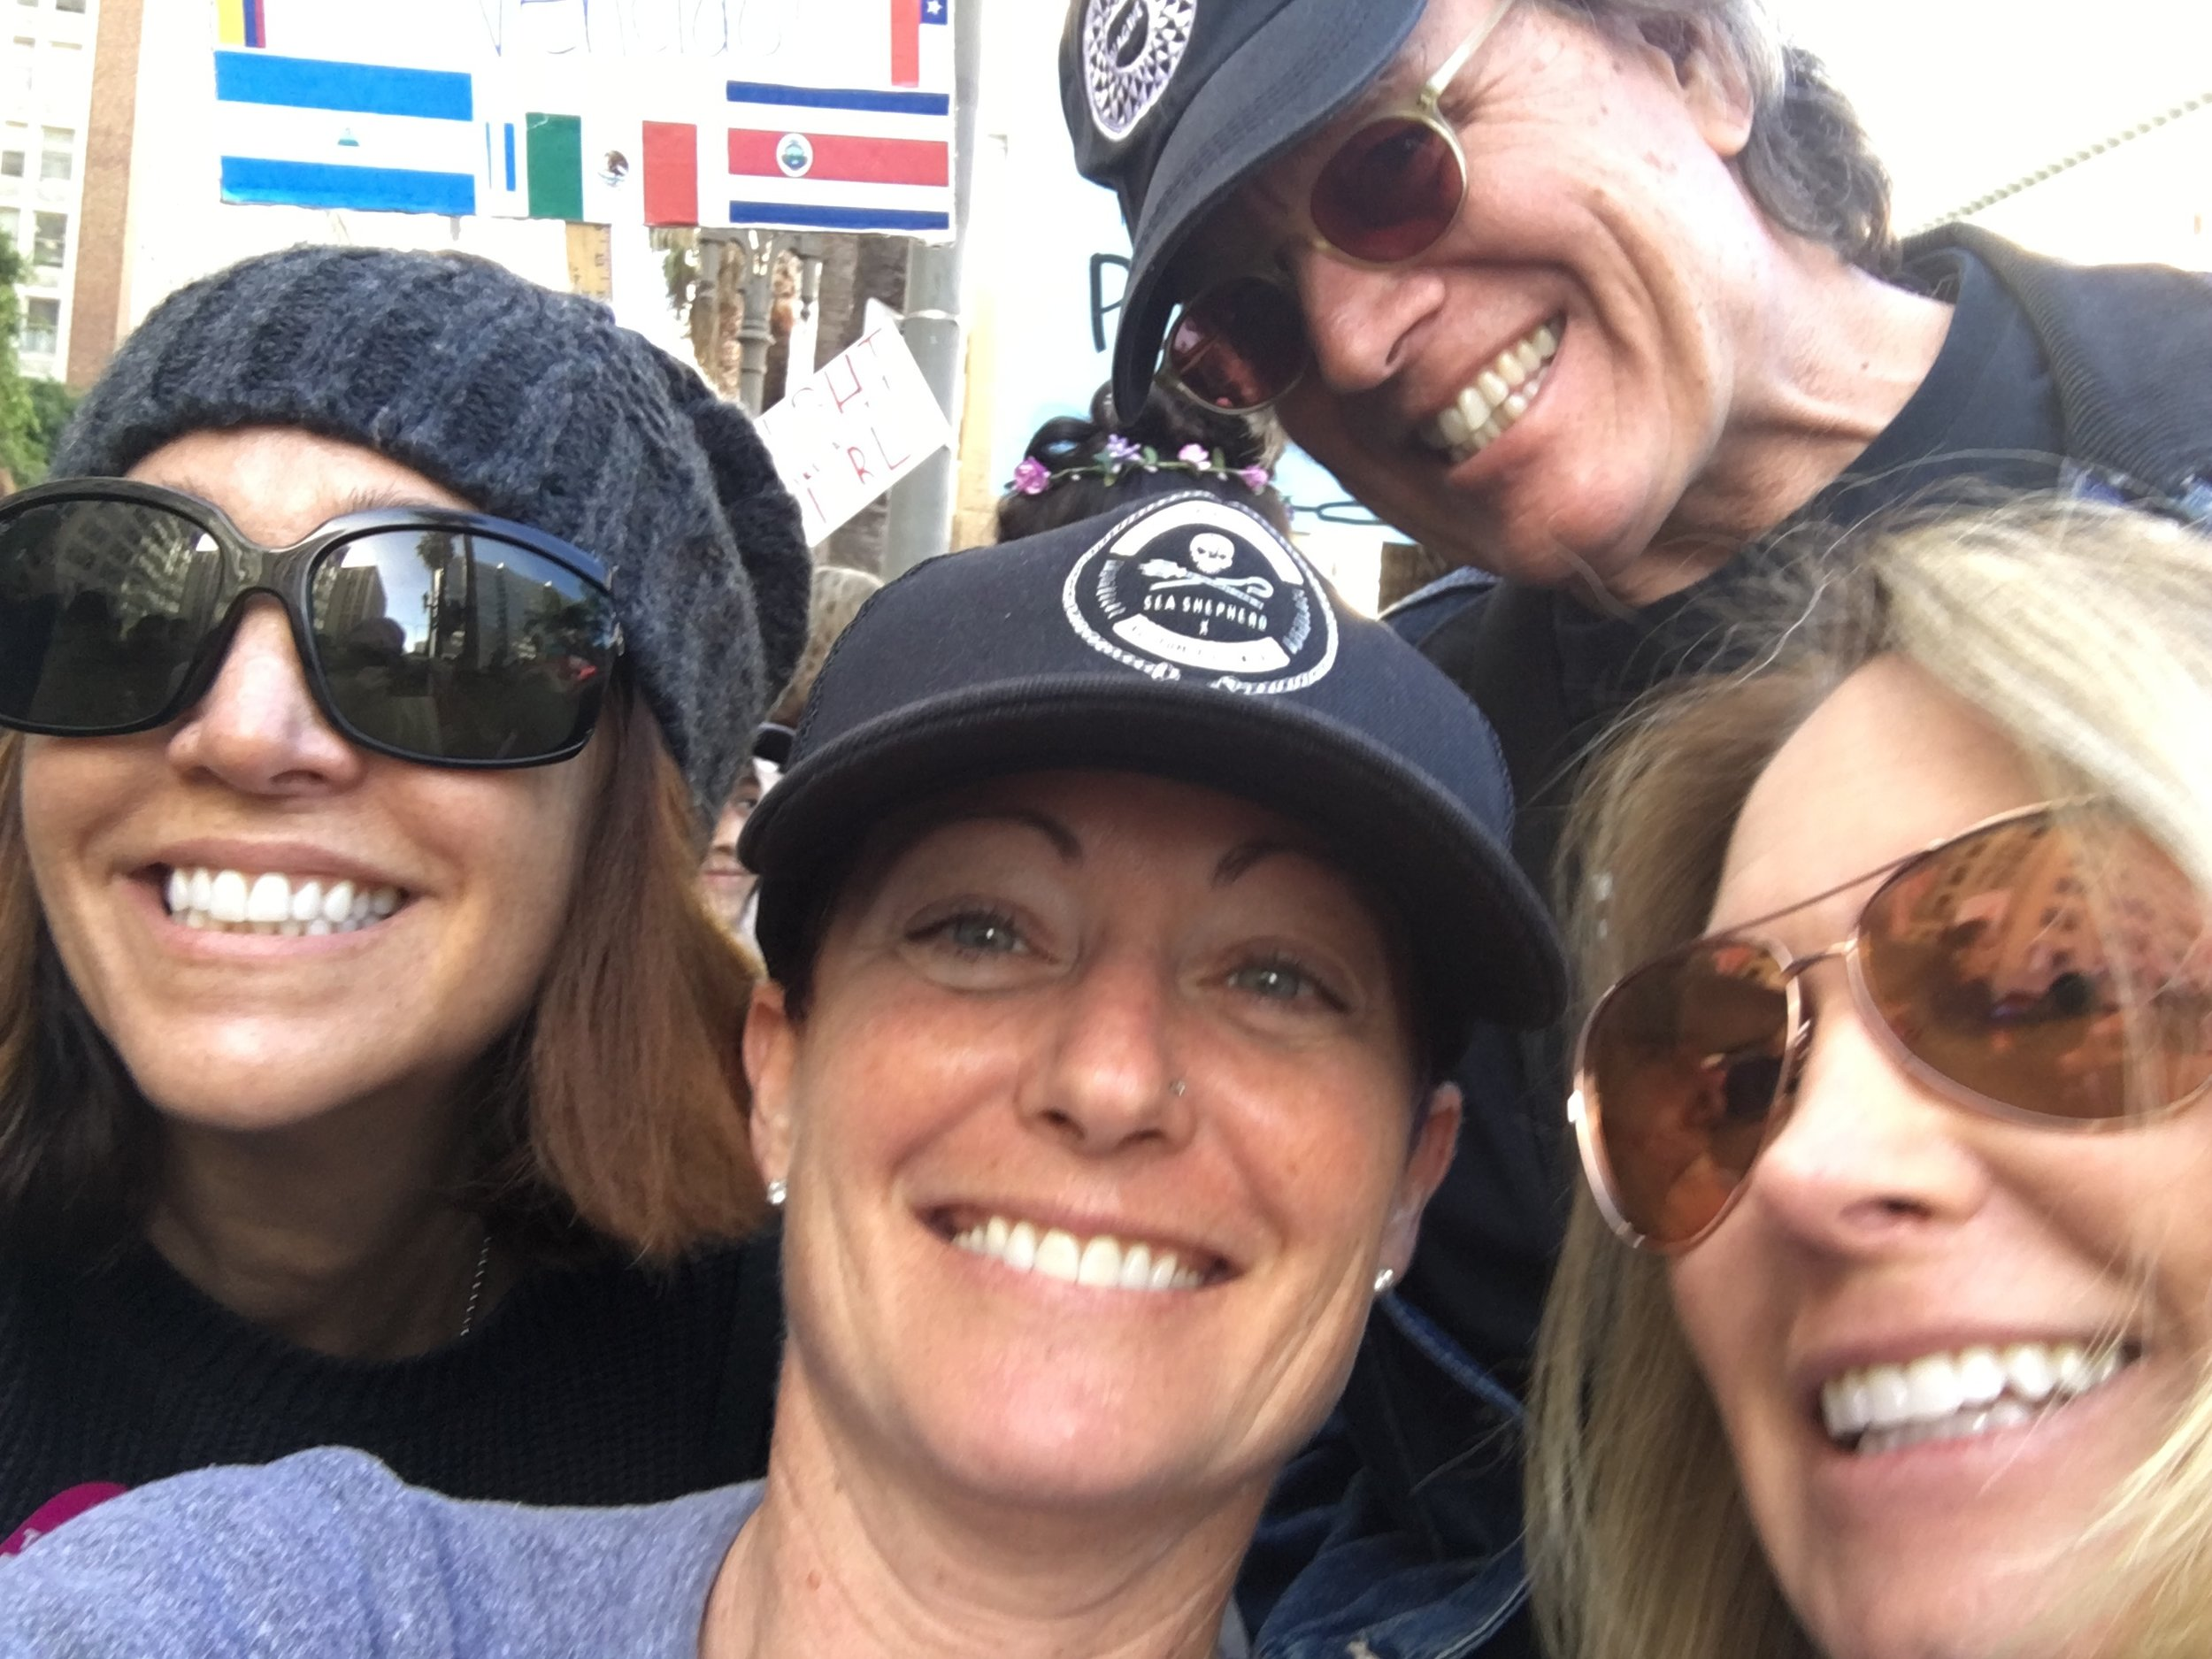 Unity march selfie